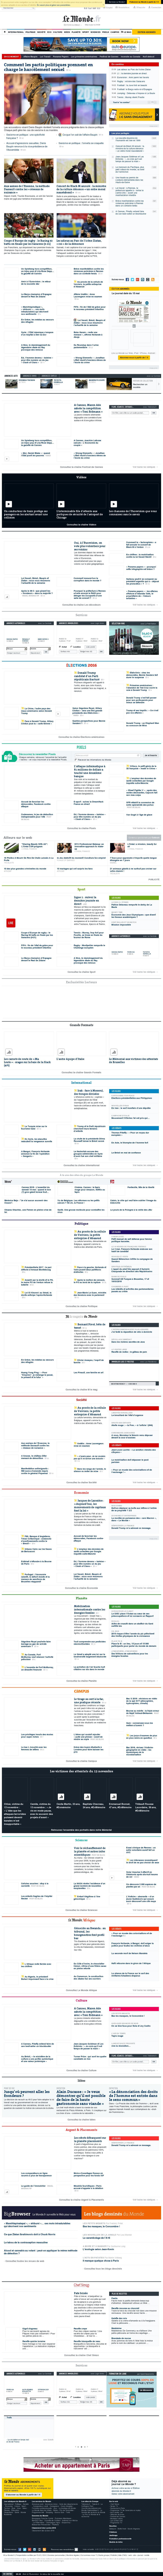 Le Monde at Saturday May 14, 2016, 7:10 p.m. UTC